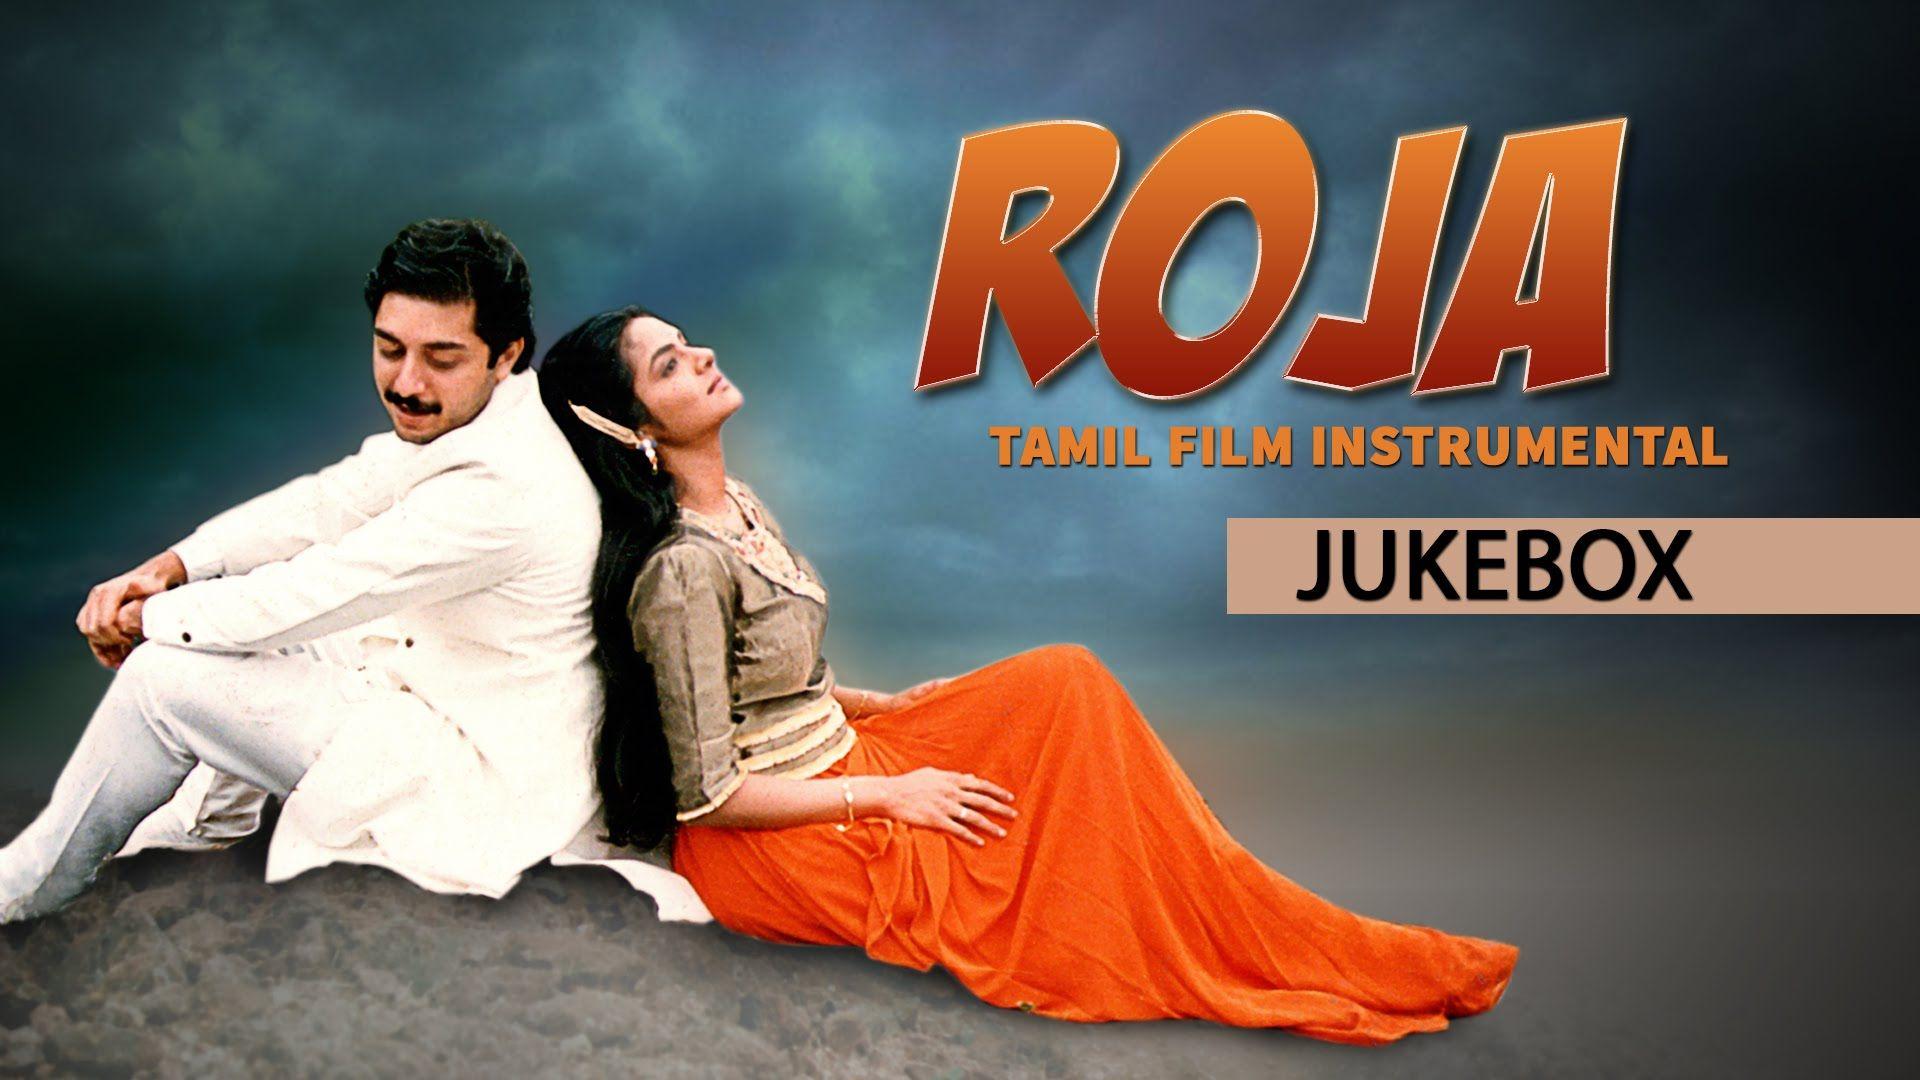 Roja Movie Tamil Film Instrumental Jukebox Arvindswamy Madhubala Movies Jukebox Film